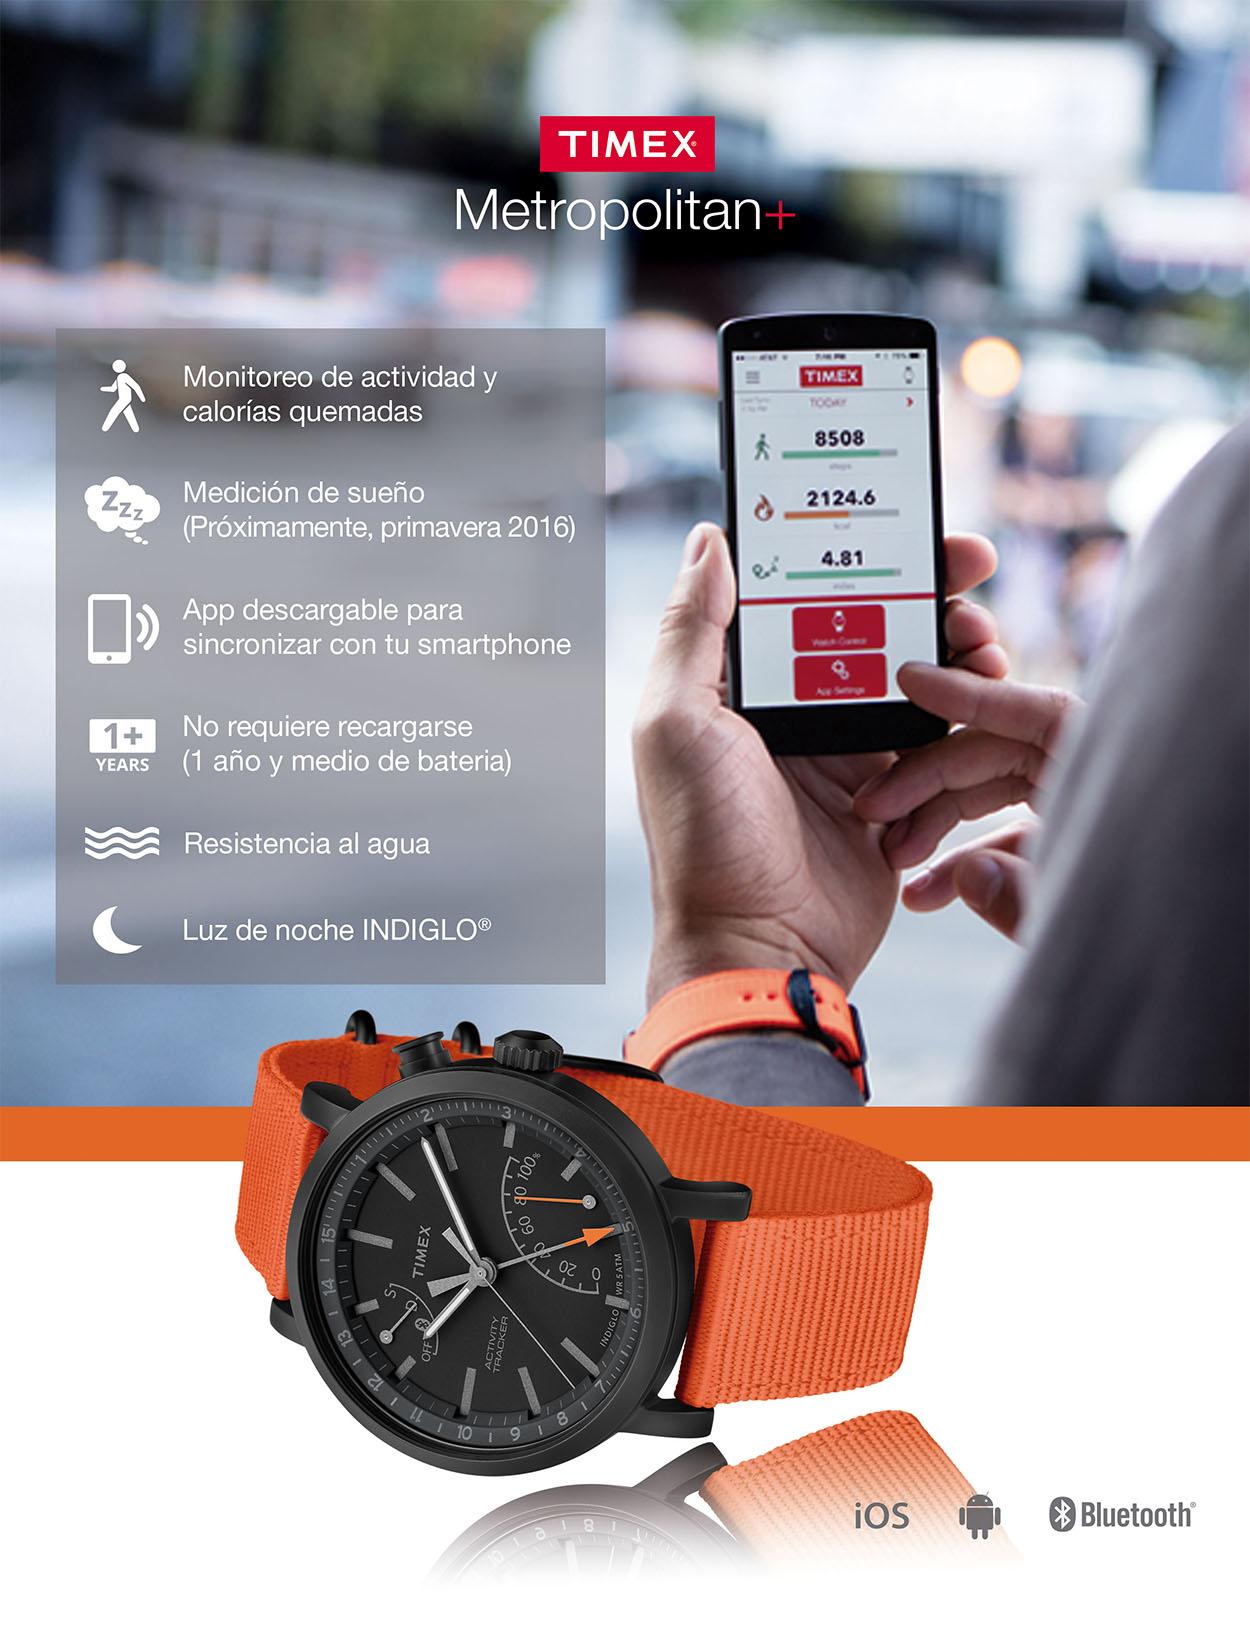 654384565e90 Reloj Smartwatch para caballero Timex Metropolitan TWG012600 negro